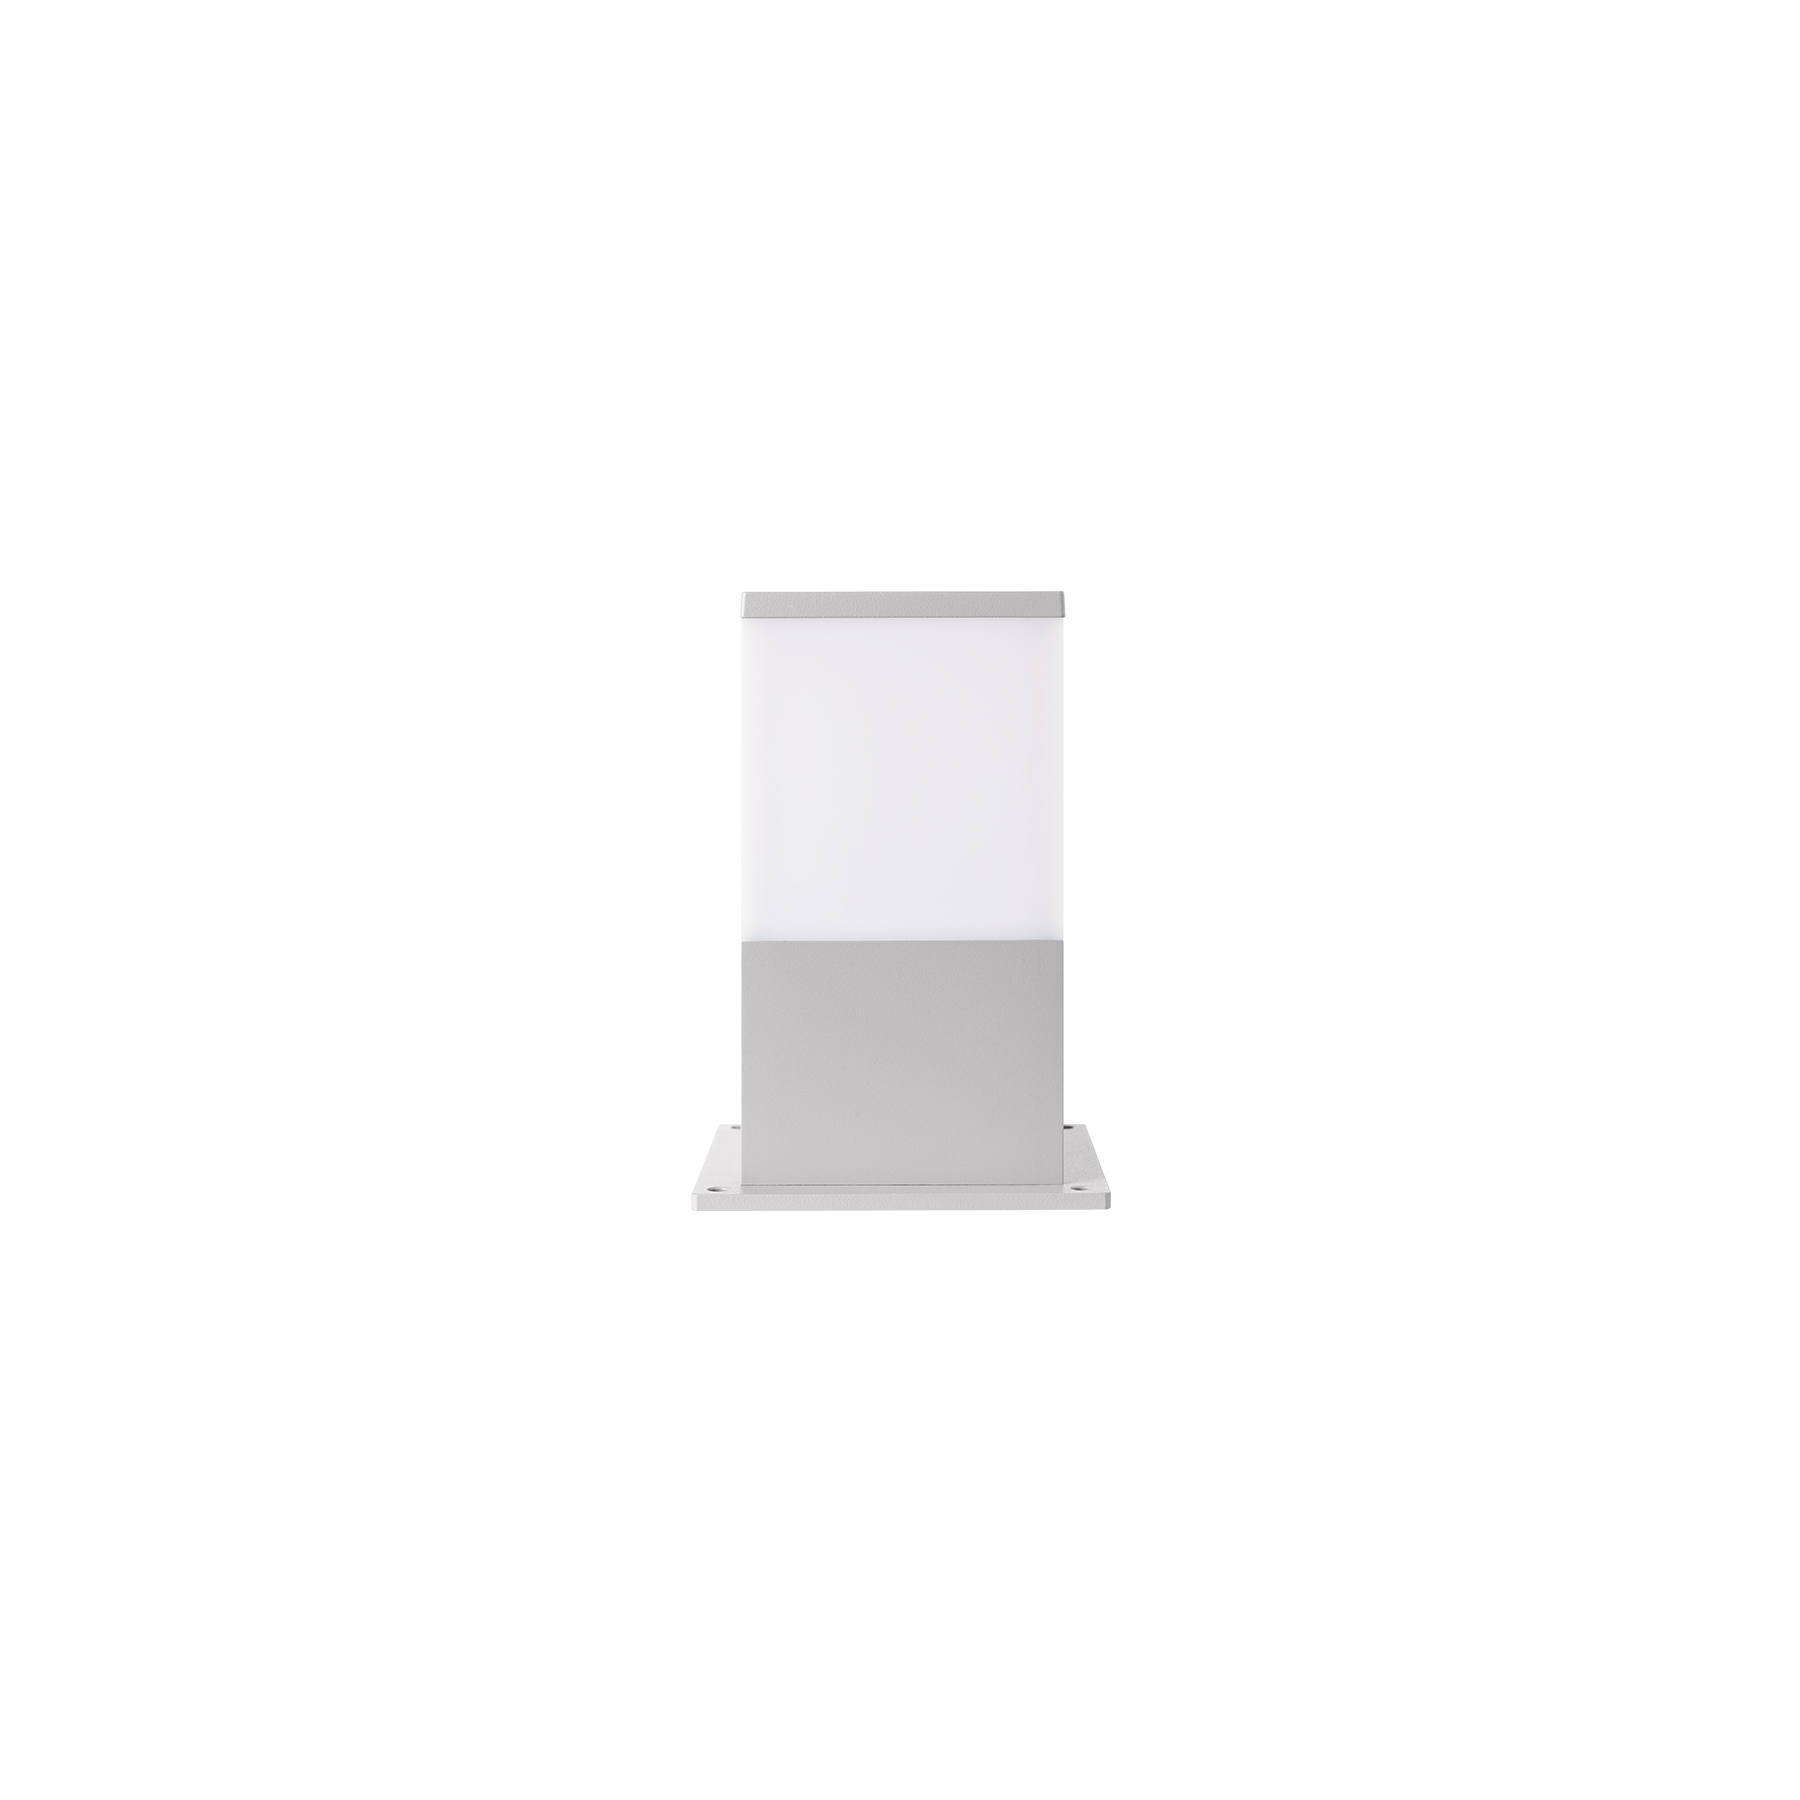 PROTON Square Opal - Pillar Top Light